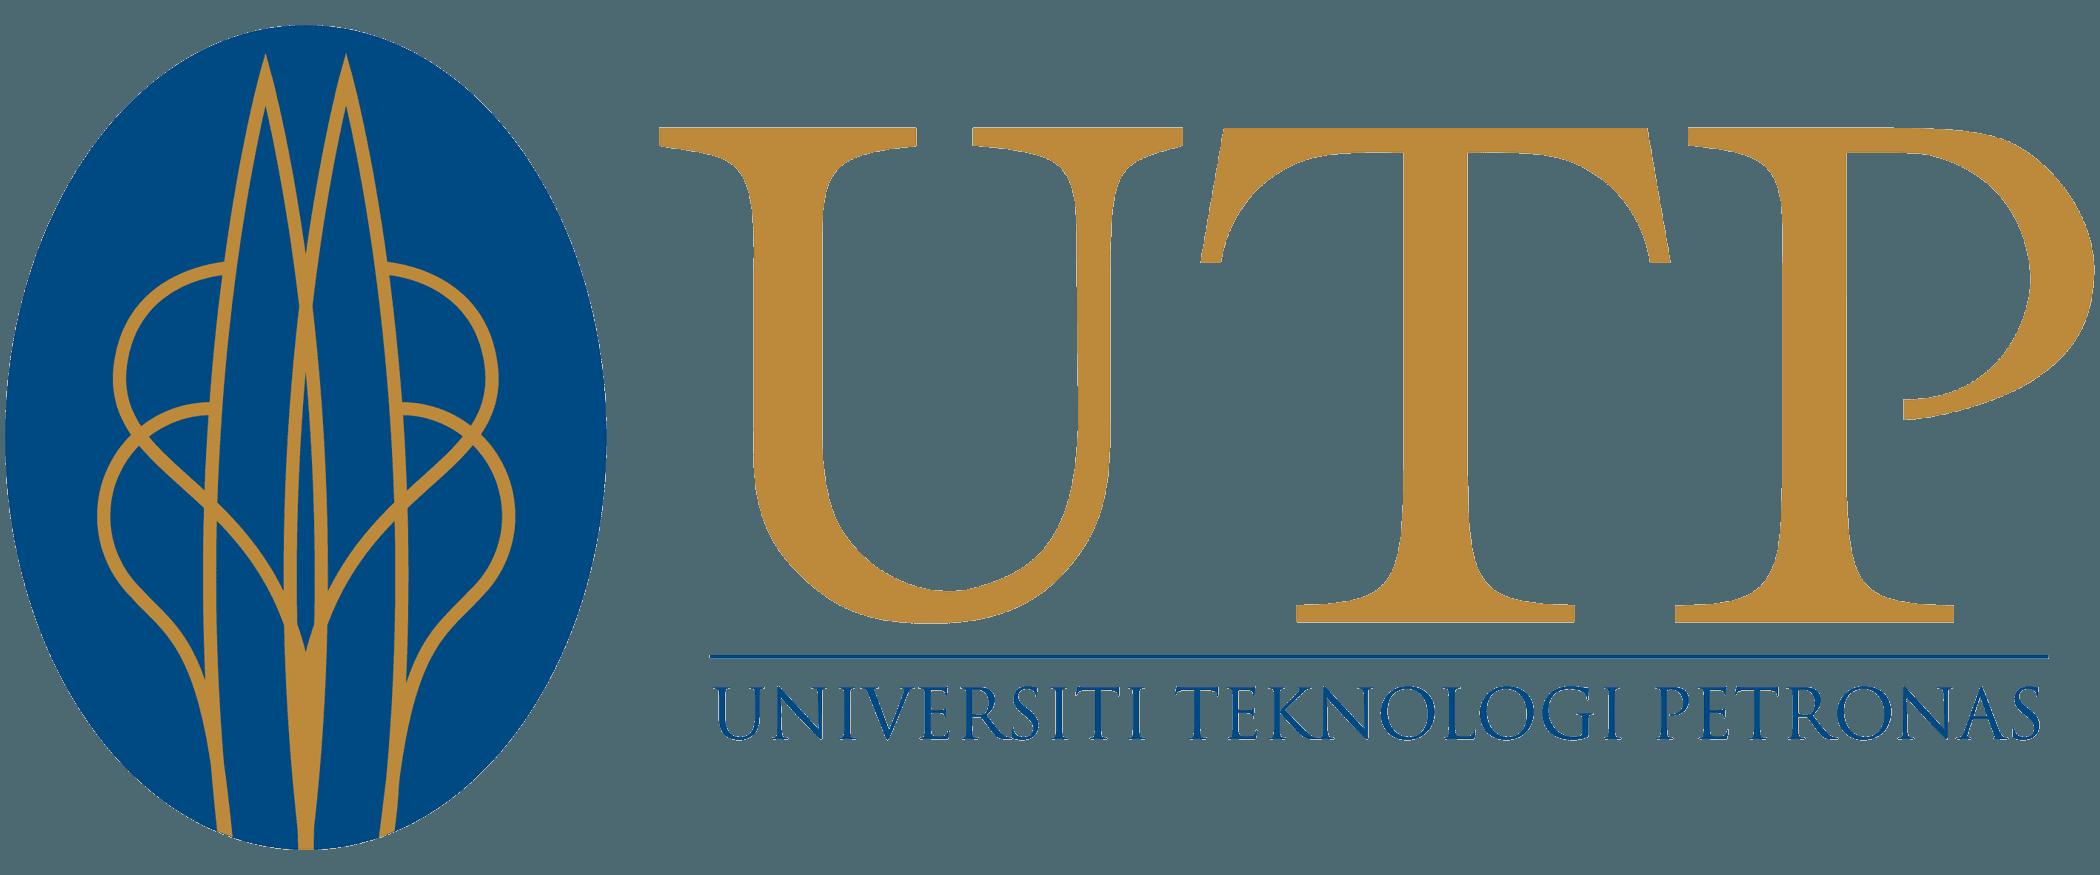 UTP Logo (Universiti Teknologi Petronas) png